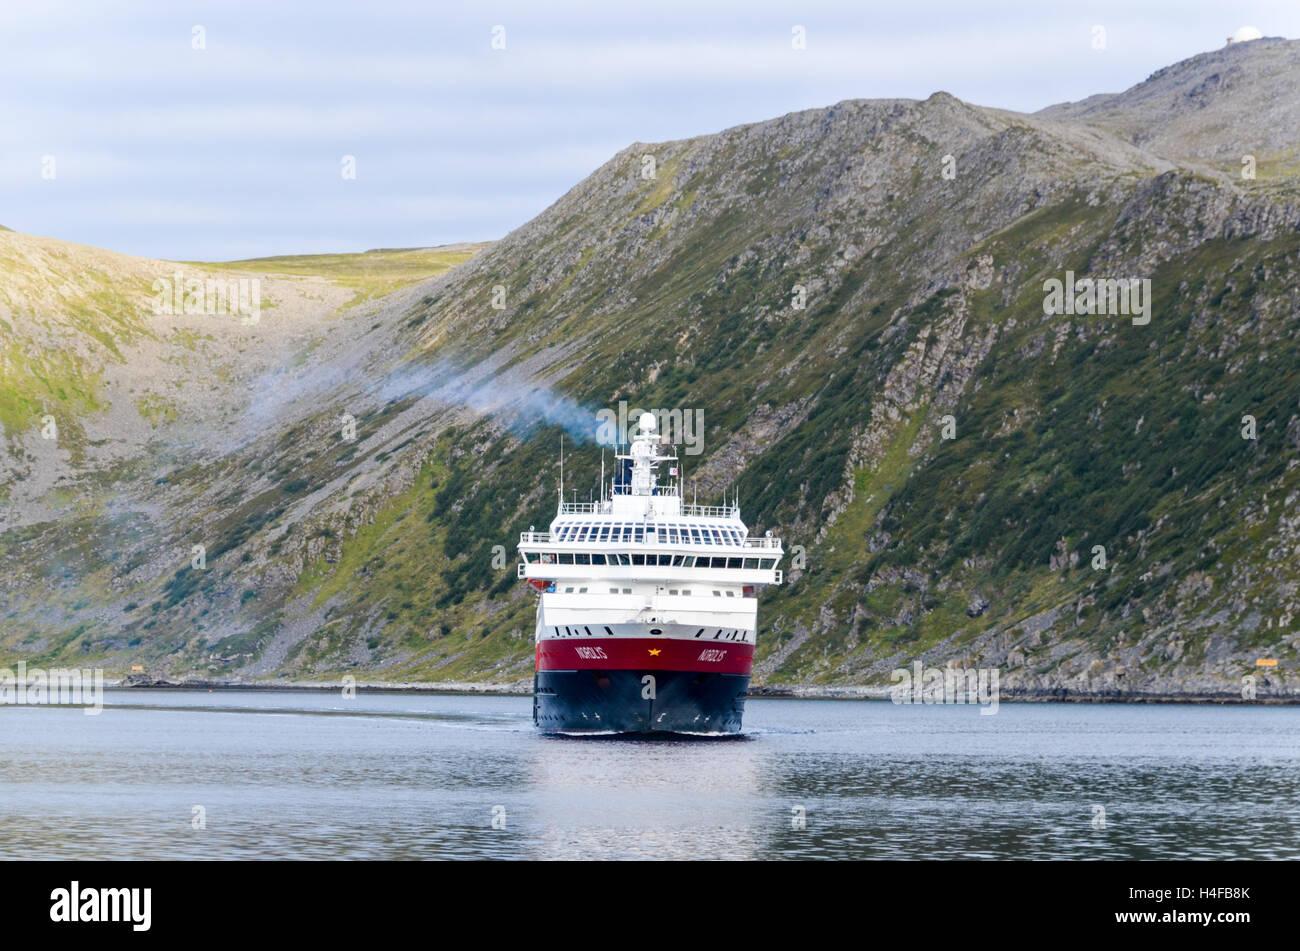 Hurtigruten ferry arriving in the port of Honningsvåg, Magerøya - Stock Image